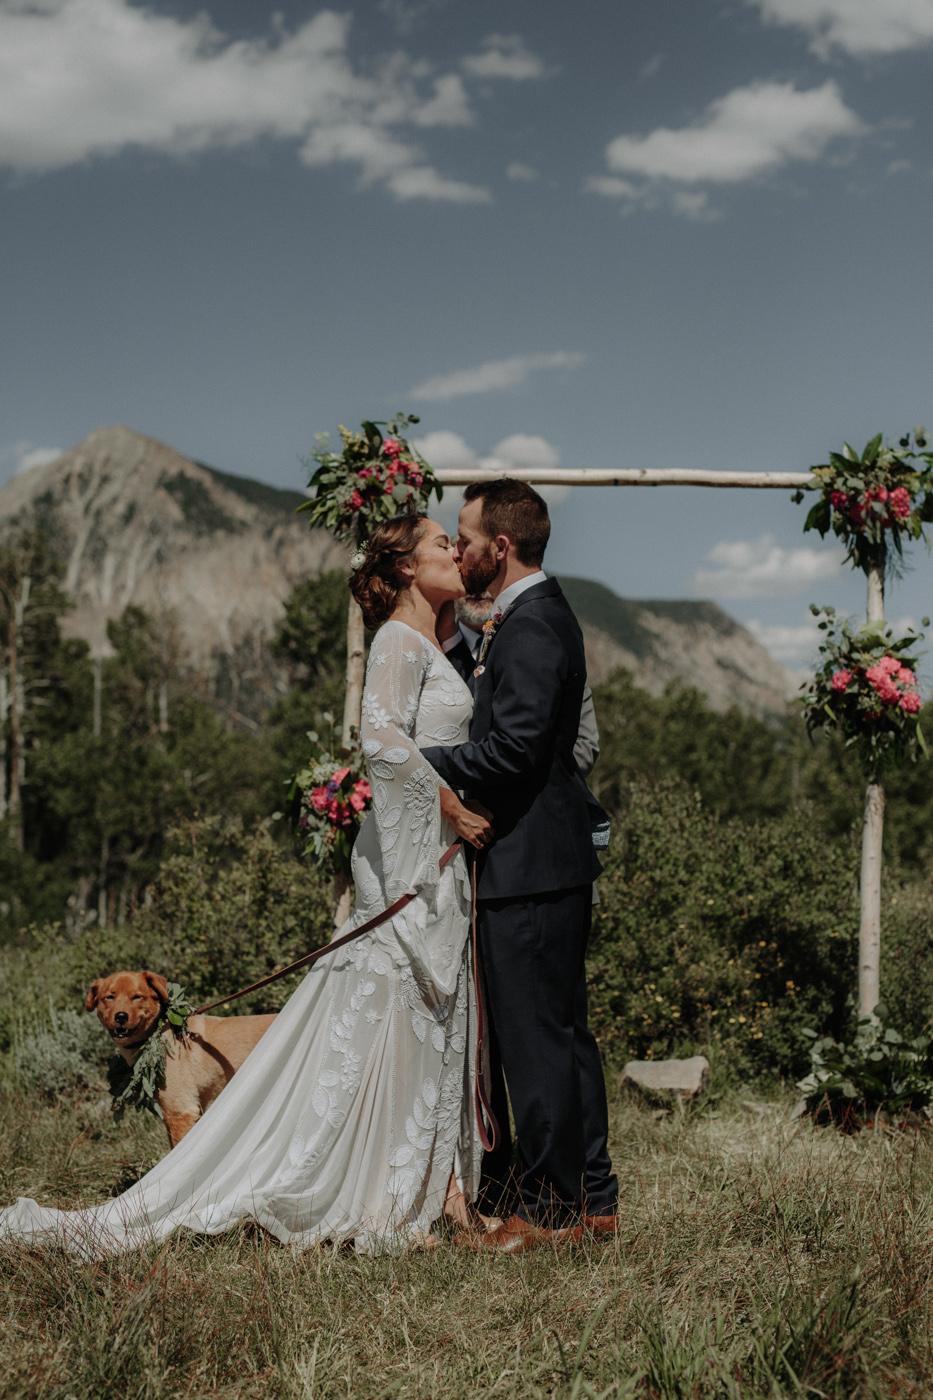 woods-walk-trail-crested-butte-colorado-wedding-52.jpg